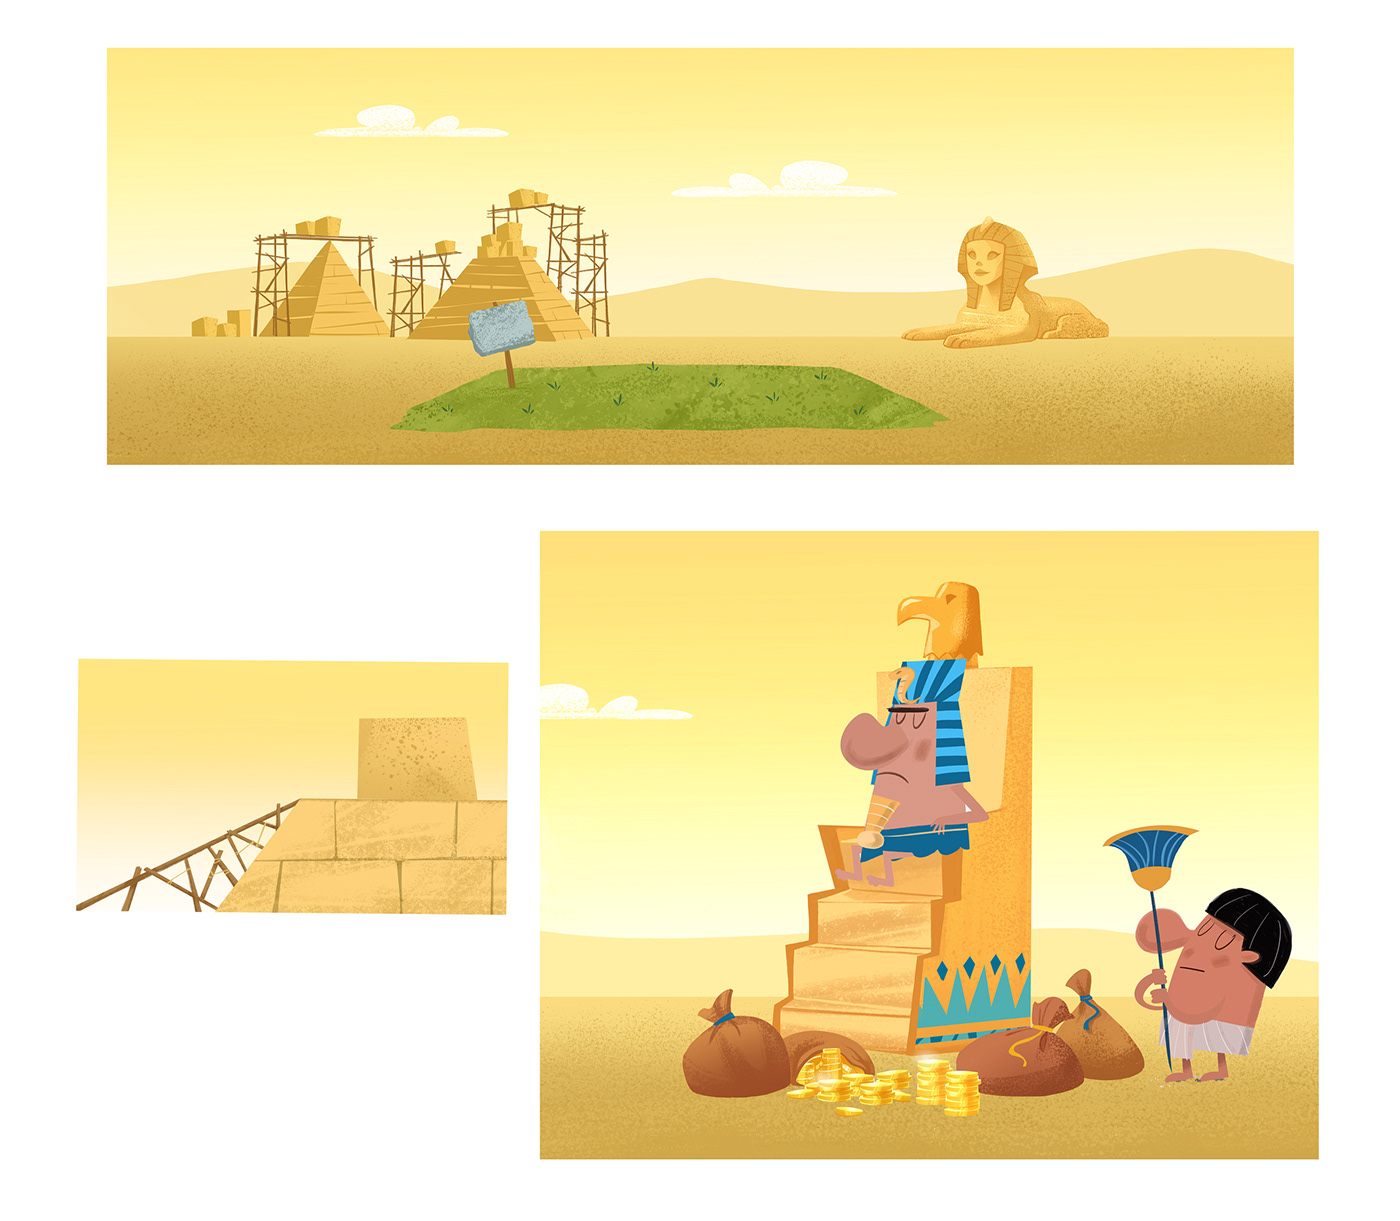 animation  background design cartoon design Digital Art  digital paint environment funny ILLUSTRATION  Visual Development